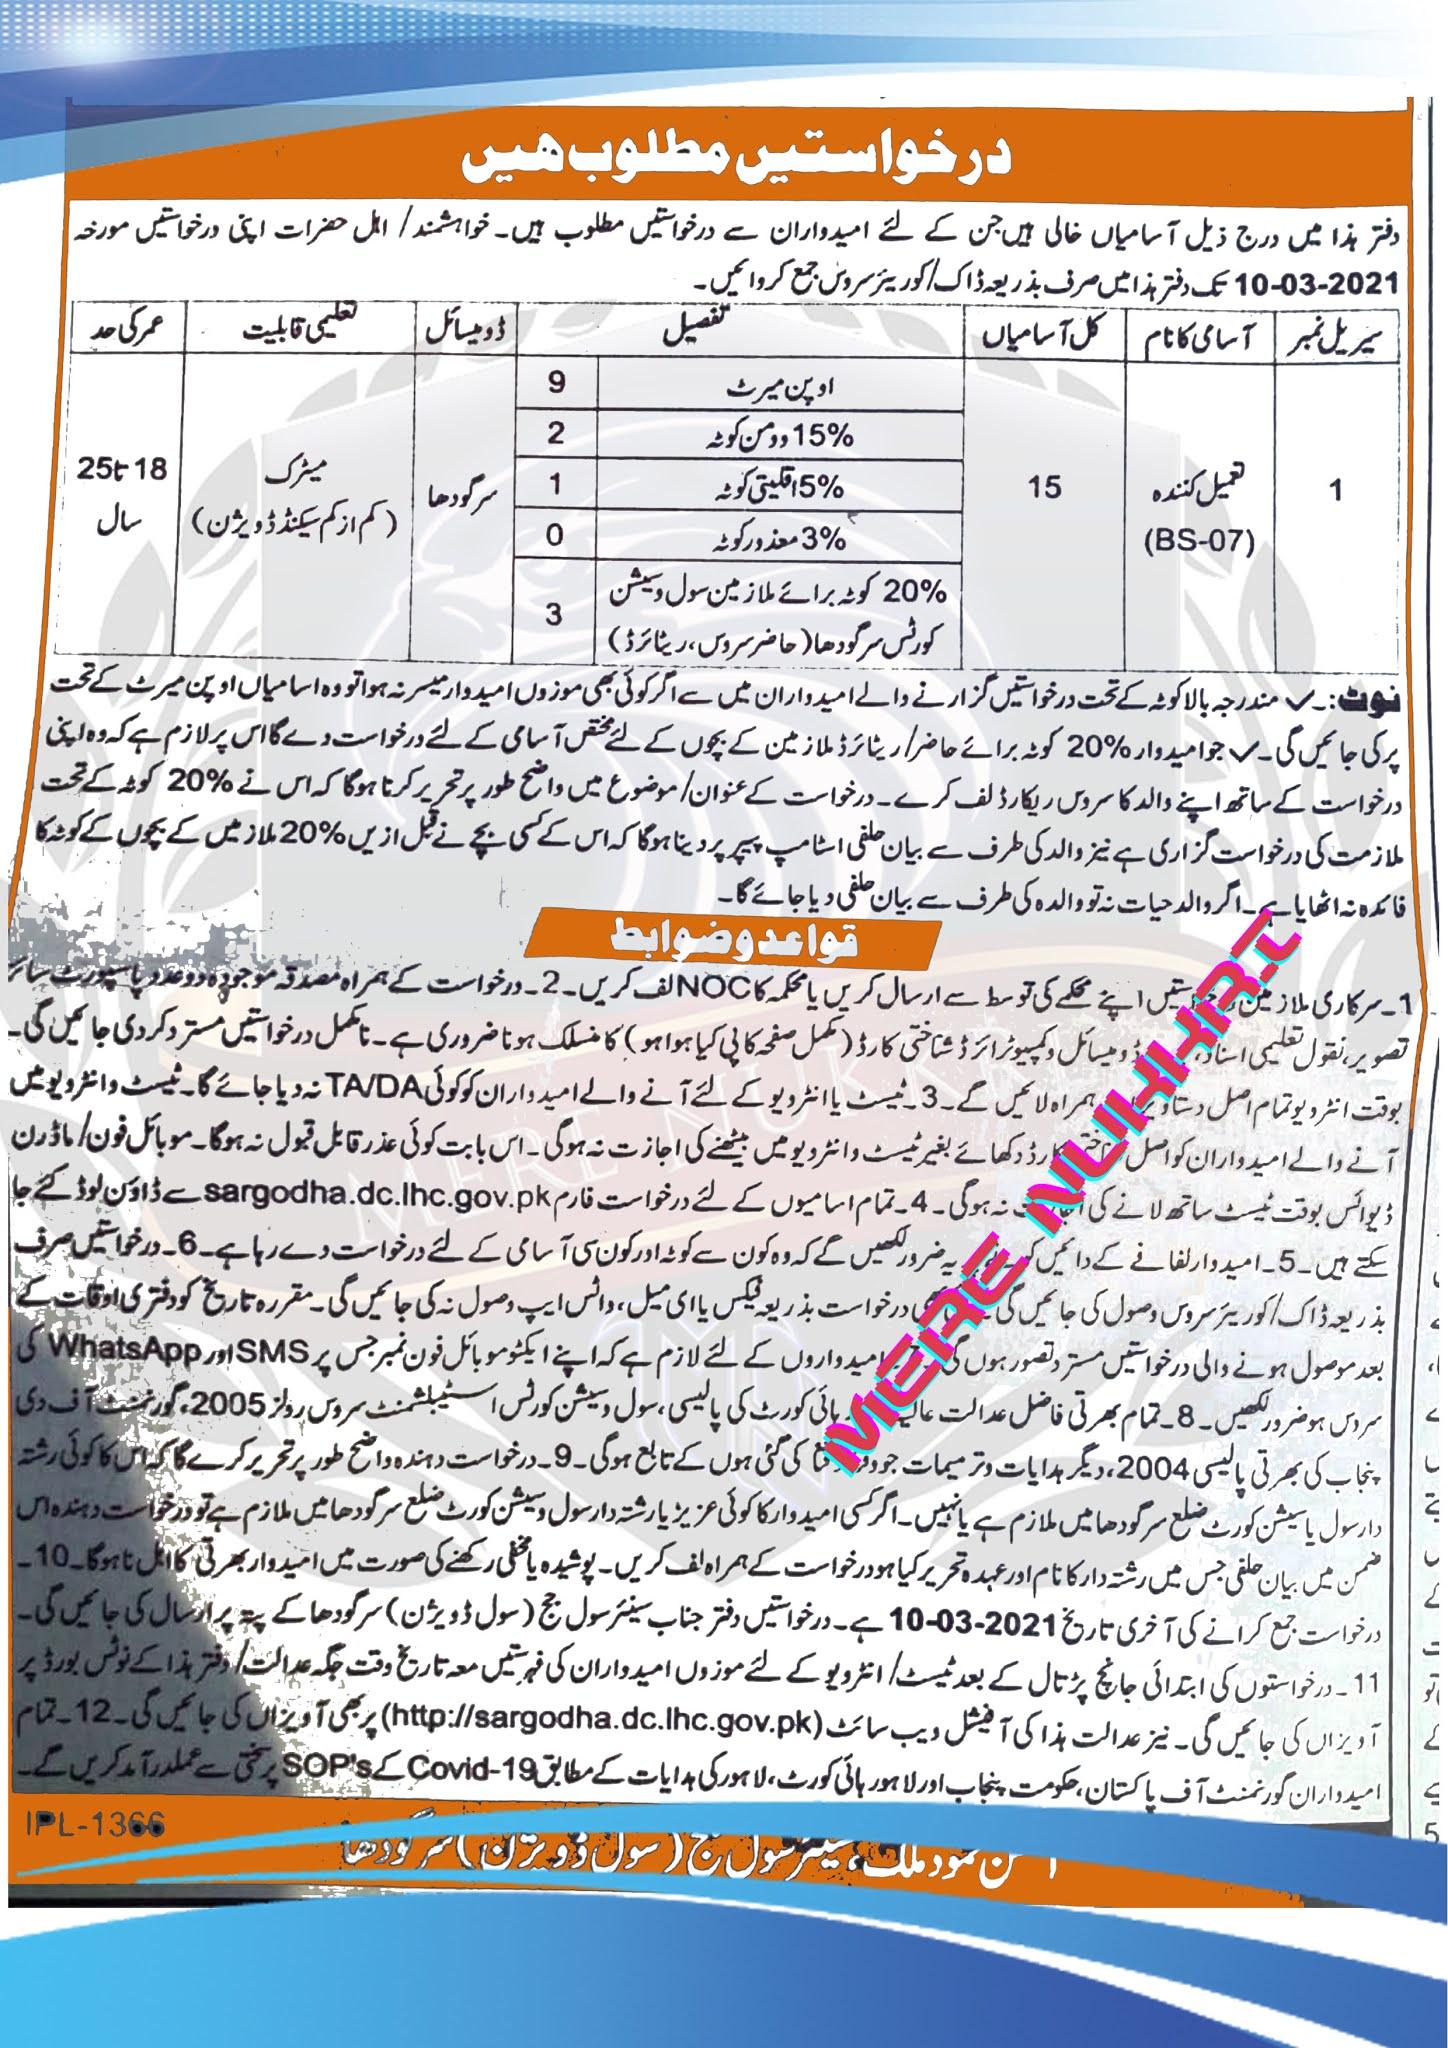 Civil Court Sargodha Jobs Application Form Download 2021 Online | sargodha.dc.lhc.gov.pk